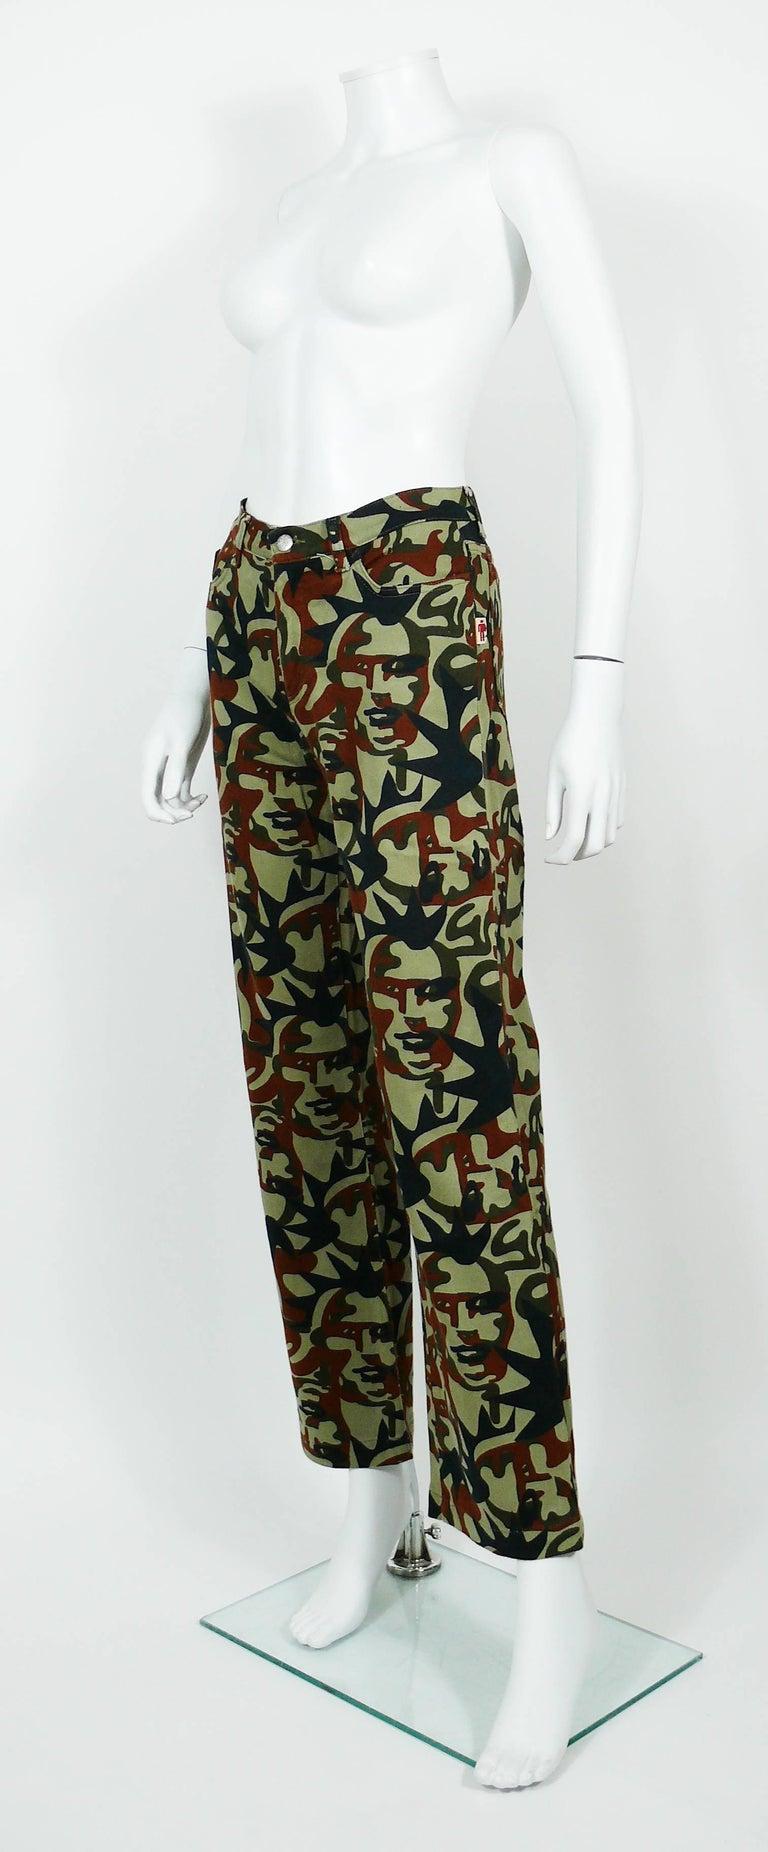 Jean Paul Gaultier Vintage Camouflage Faces Pants Trousers For Sale 1